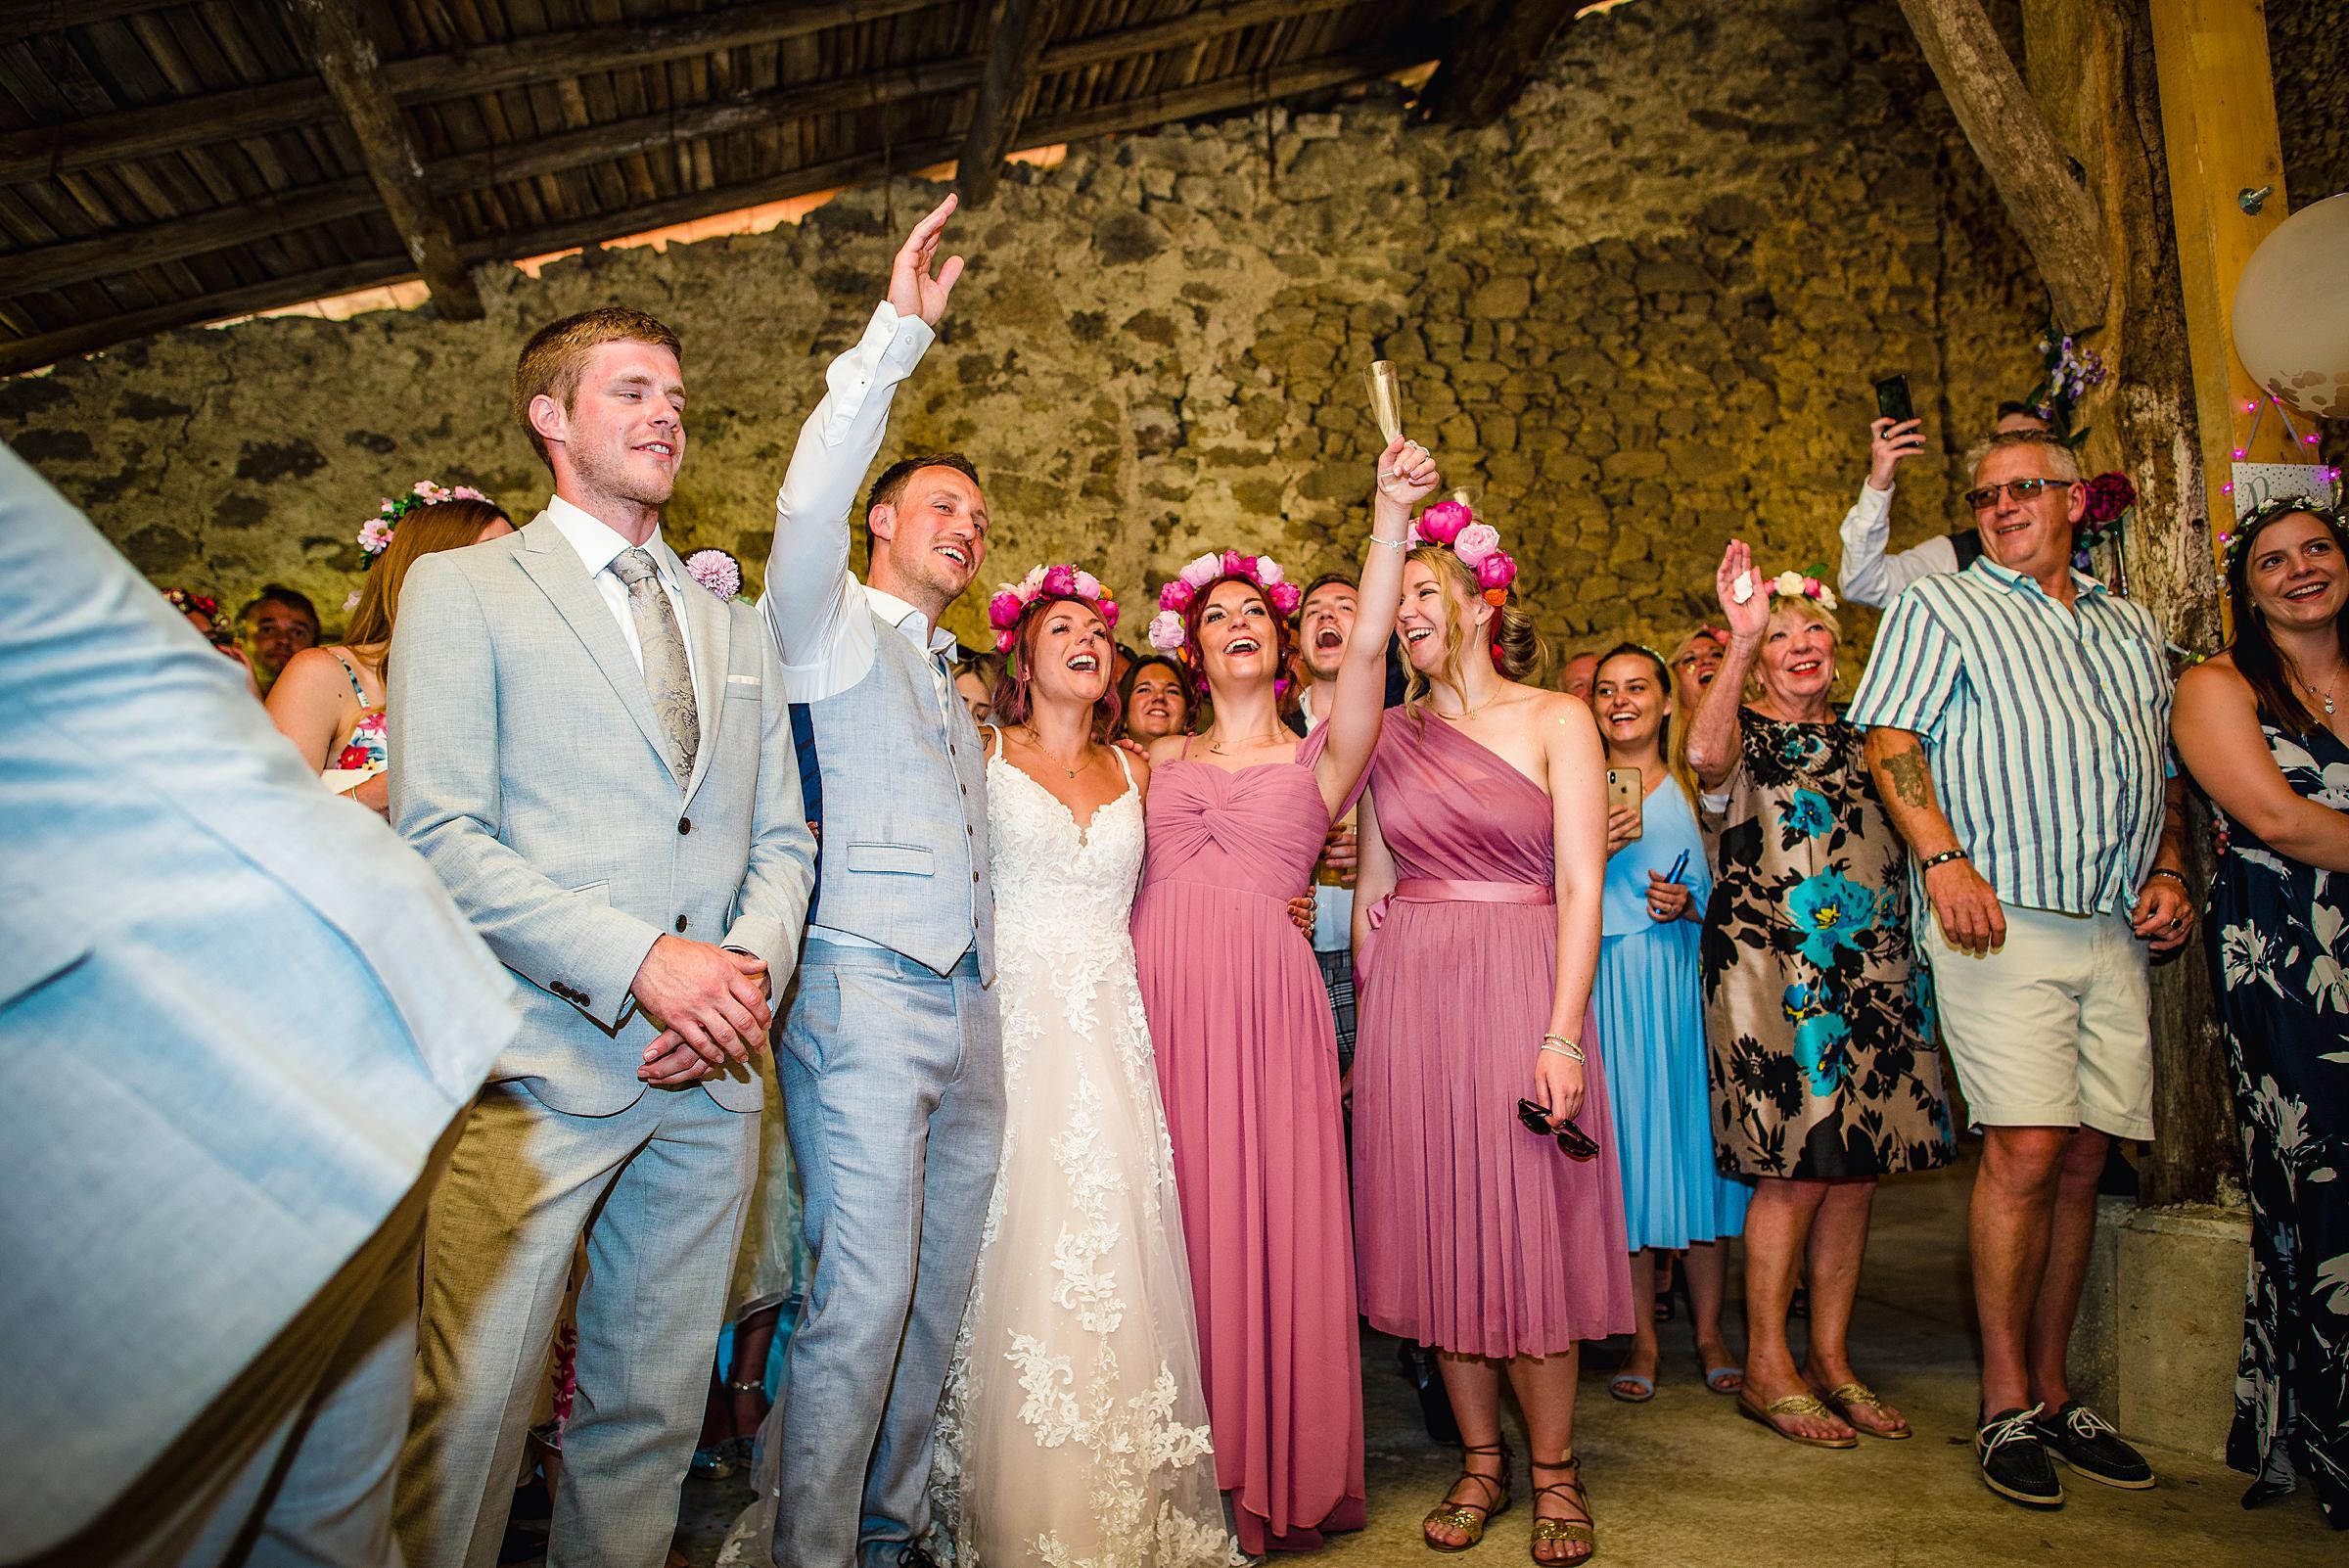 Back Garden Festival Wedding in France - Barn Wedding